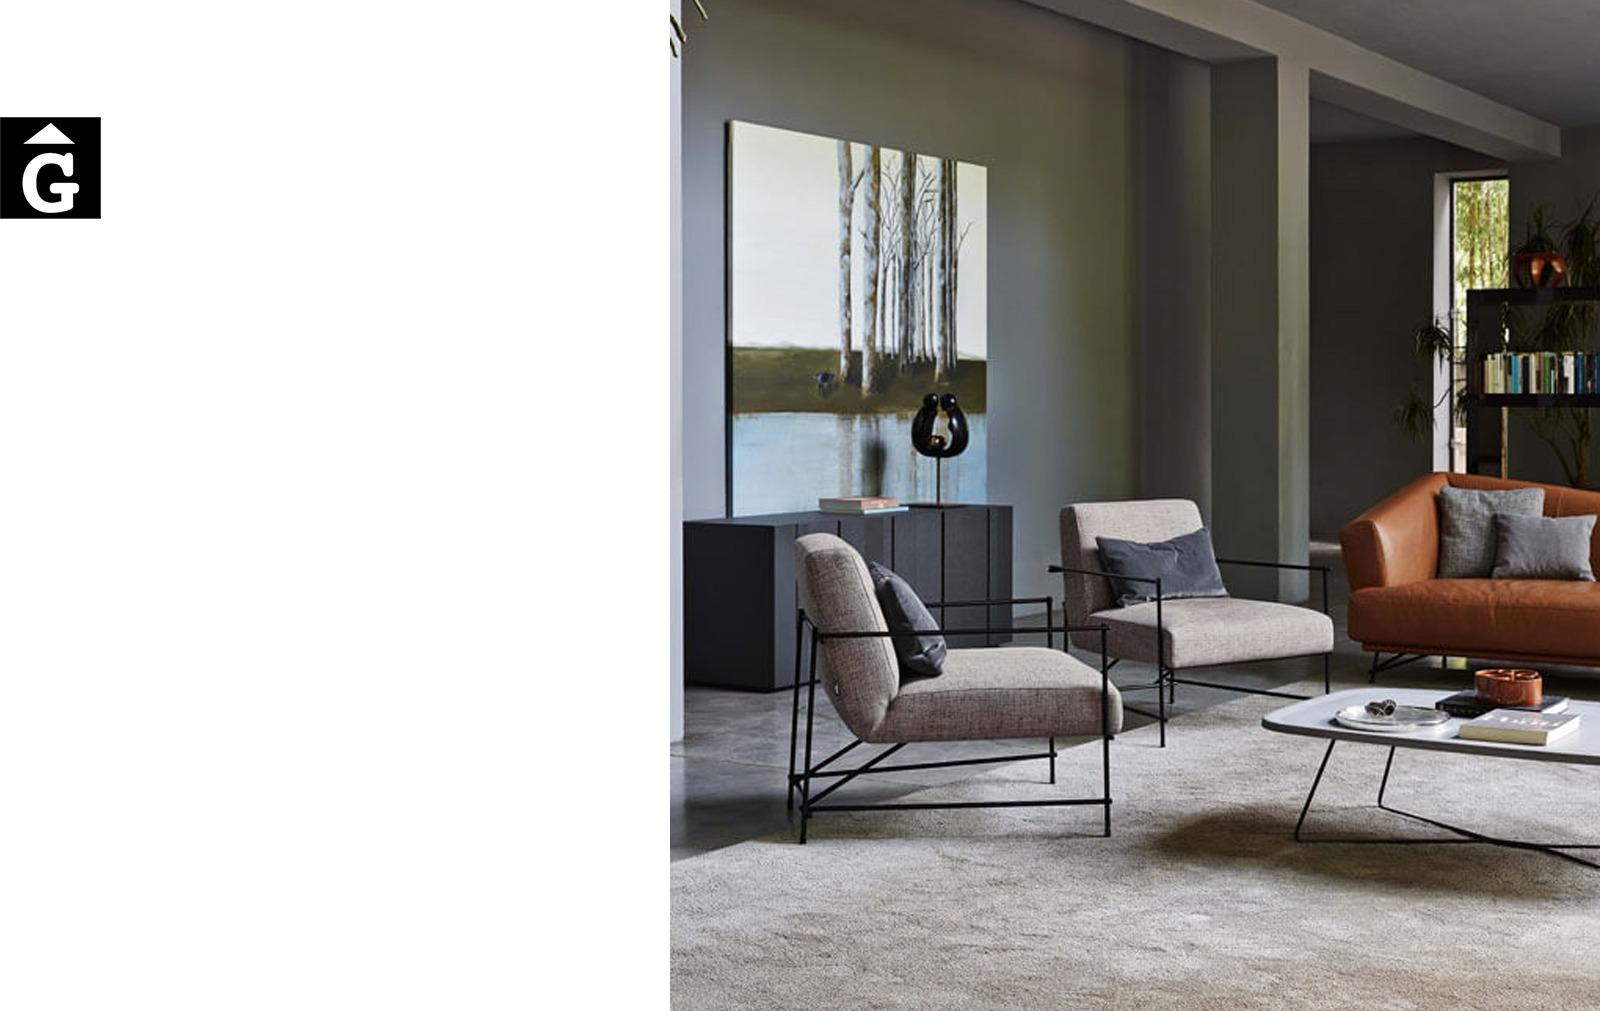 Butaca Kyo ambientda - Ditre Italia Sofas disseny i qualitat alta by mobles Gifreu